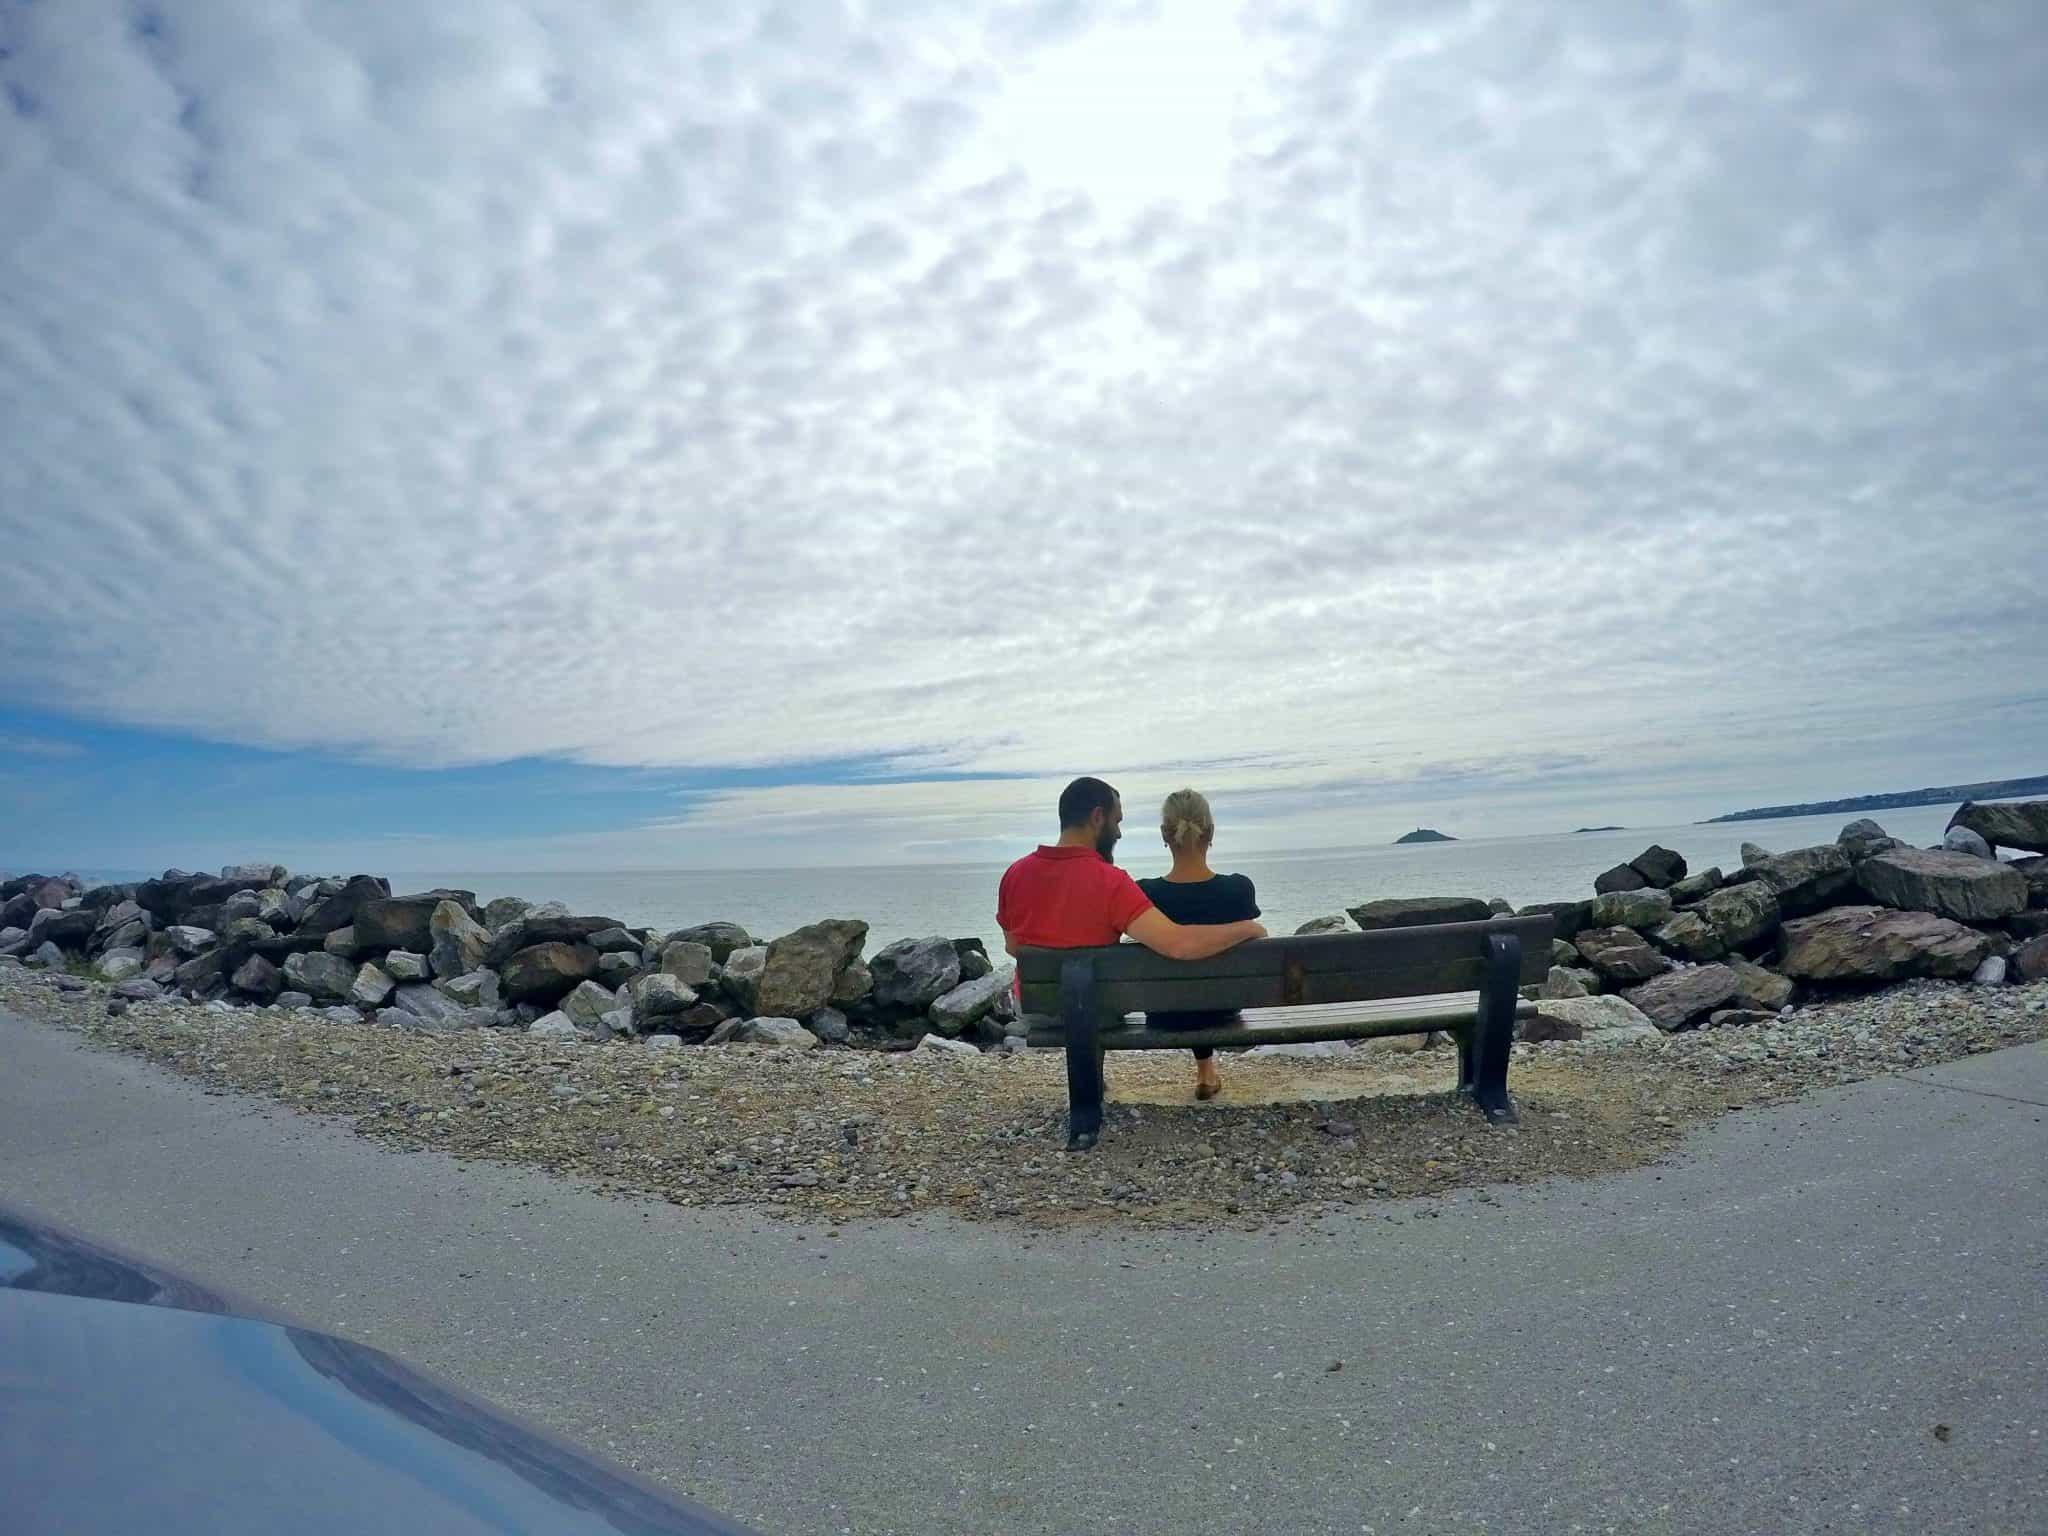 Random Roadside stop next to the sea